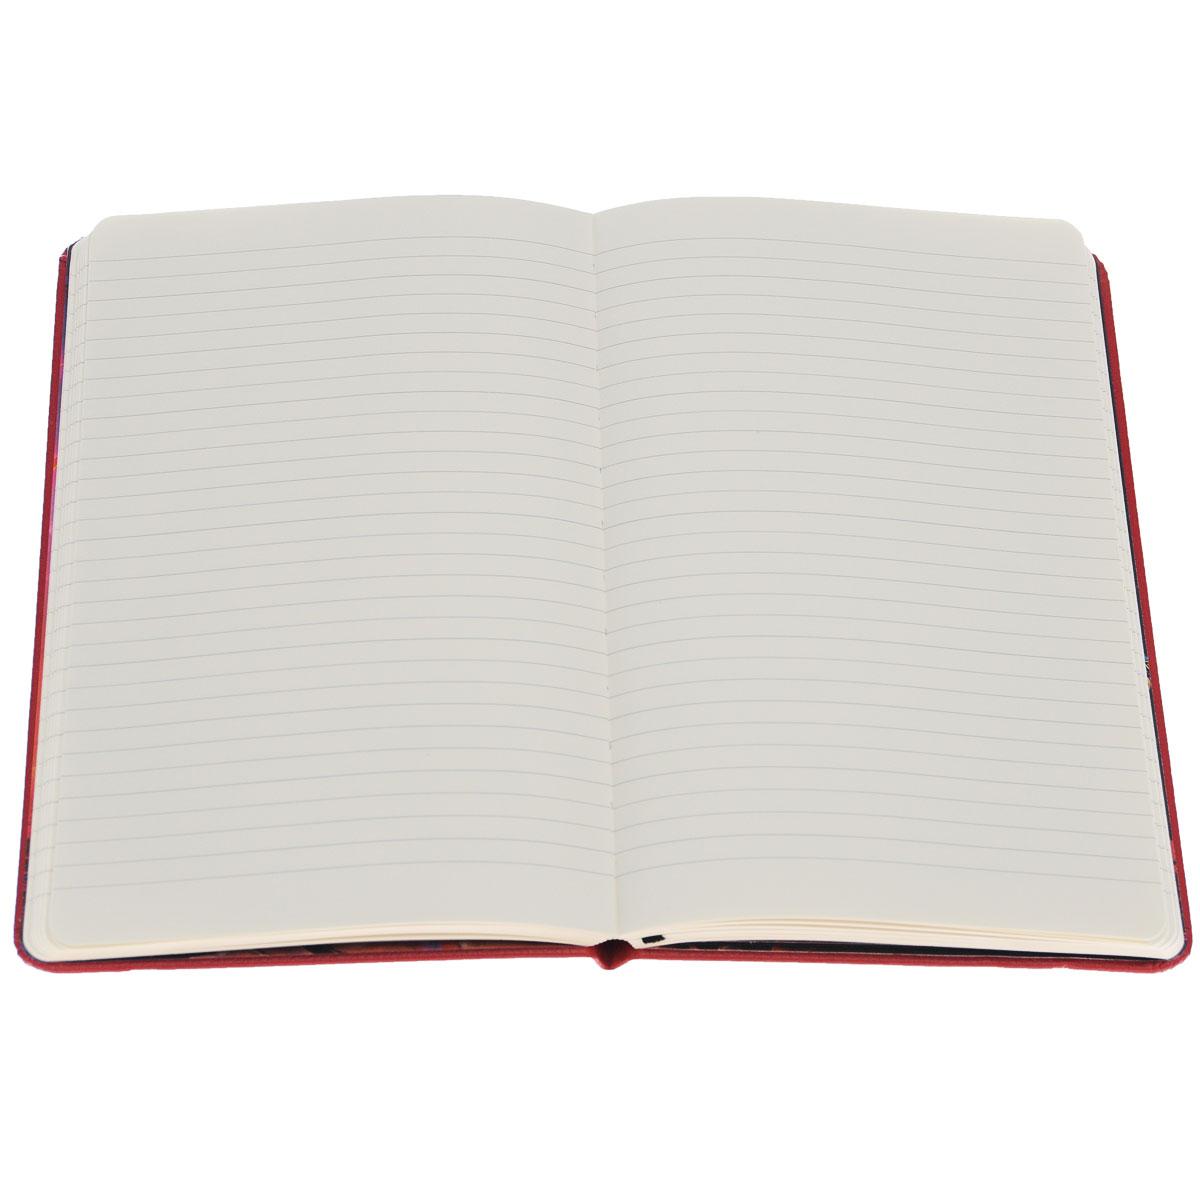 World of Warcraft: Horde: Ruled Journal with Pocket